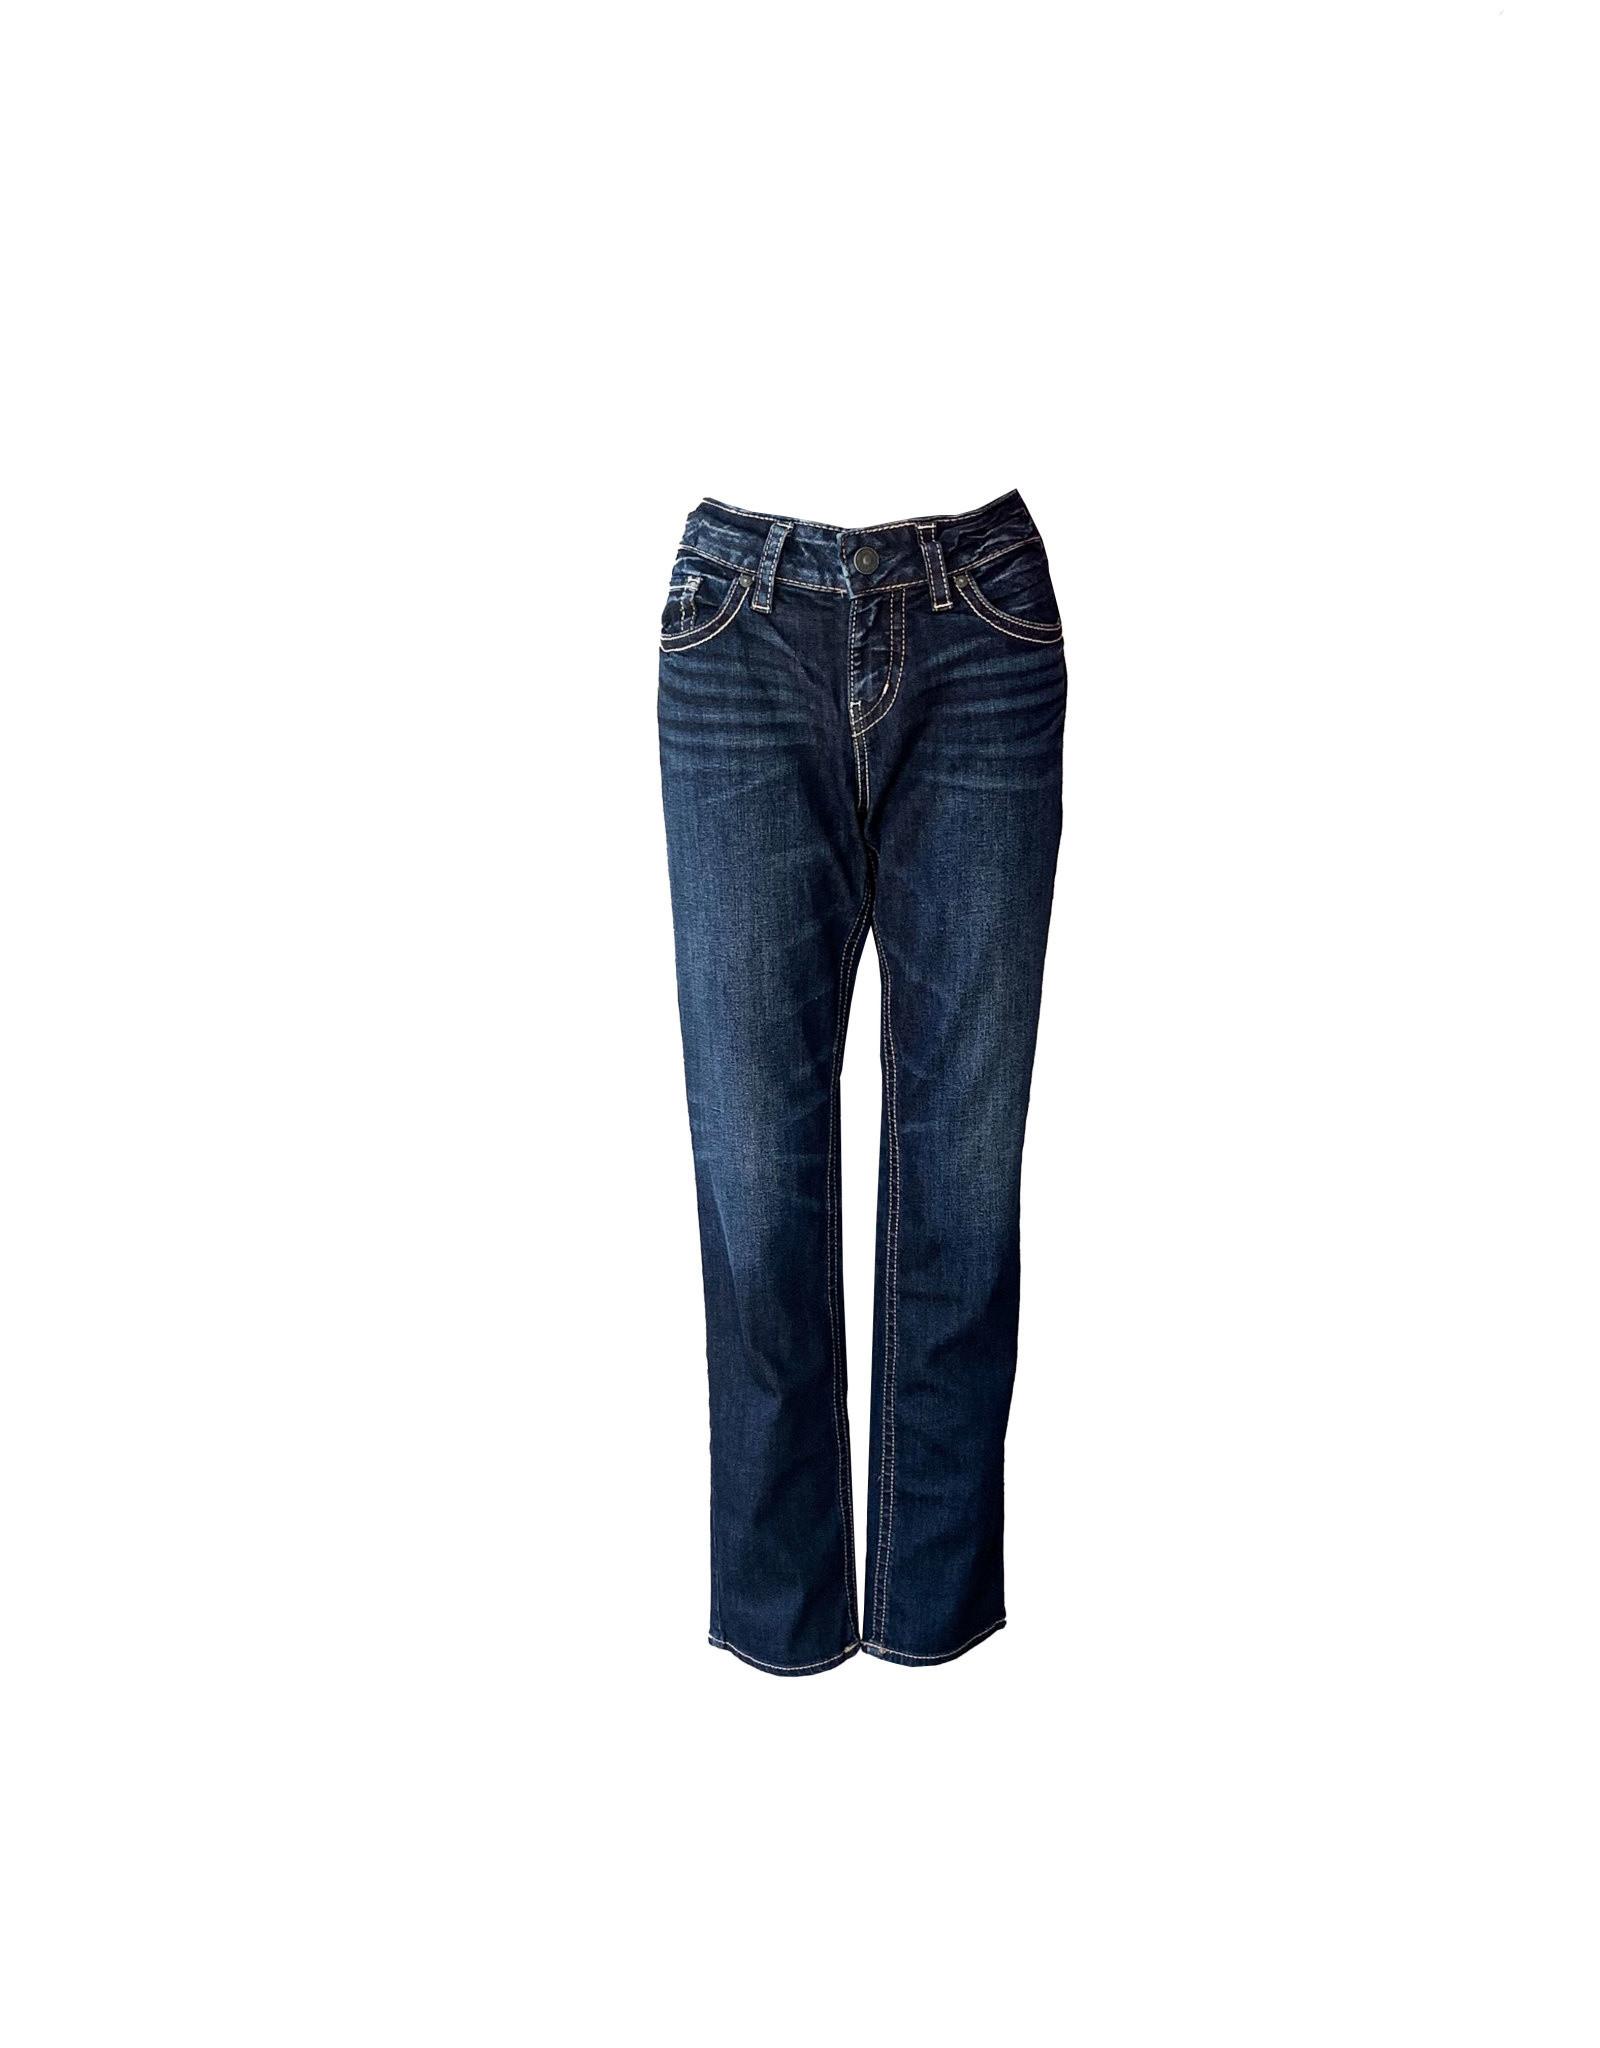 SILVER JEANS.CO SILVER  JEANS. CO Women's Suki Straight Leg JeansSize29/32